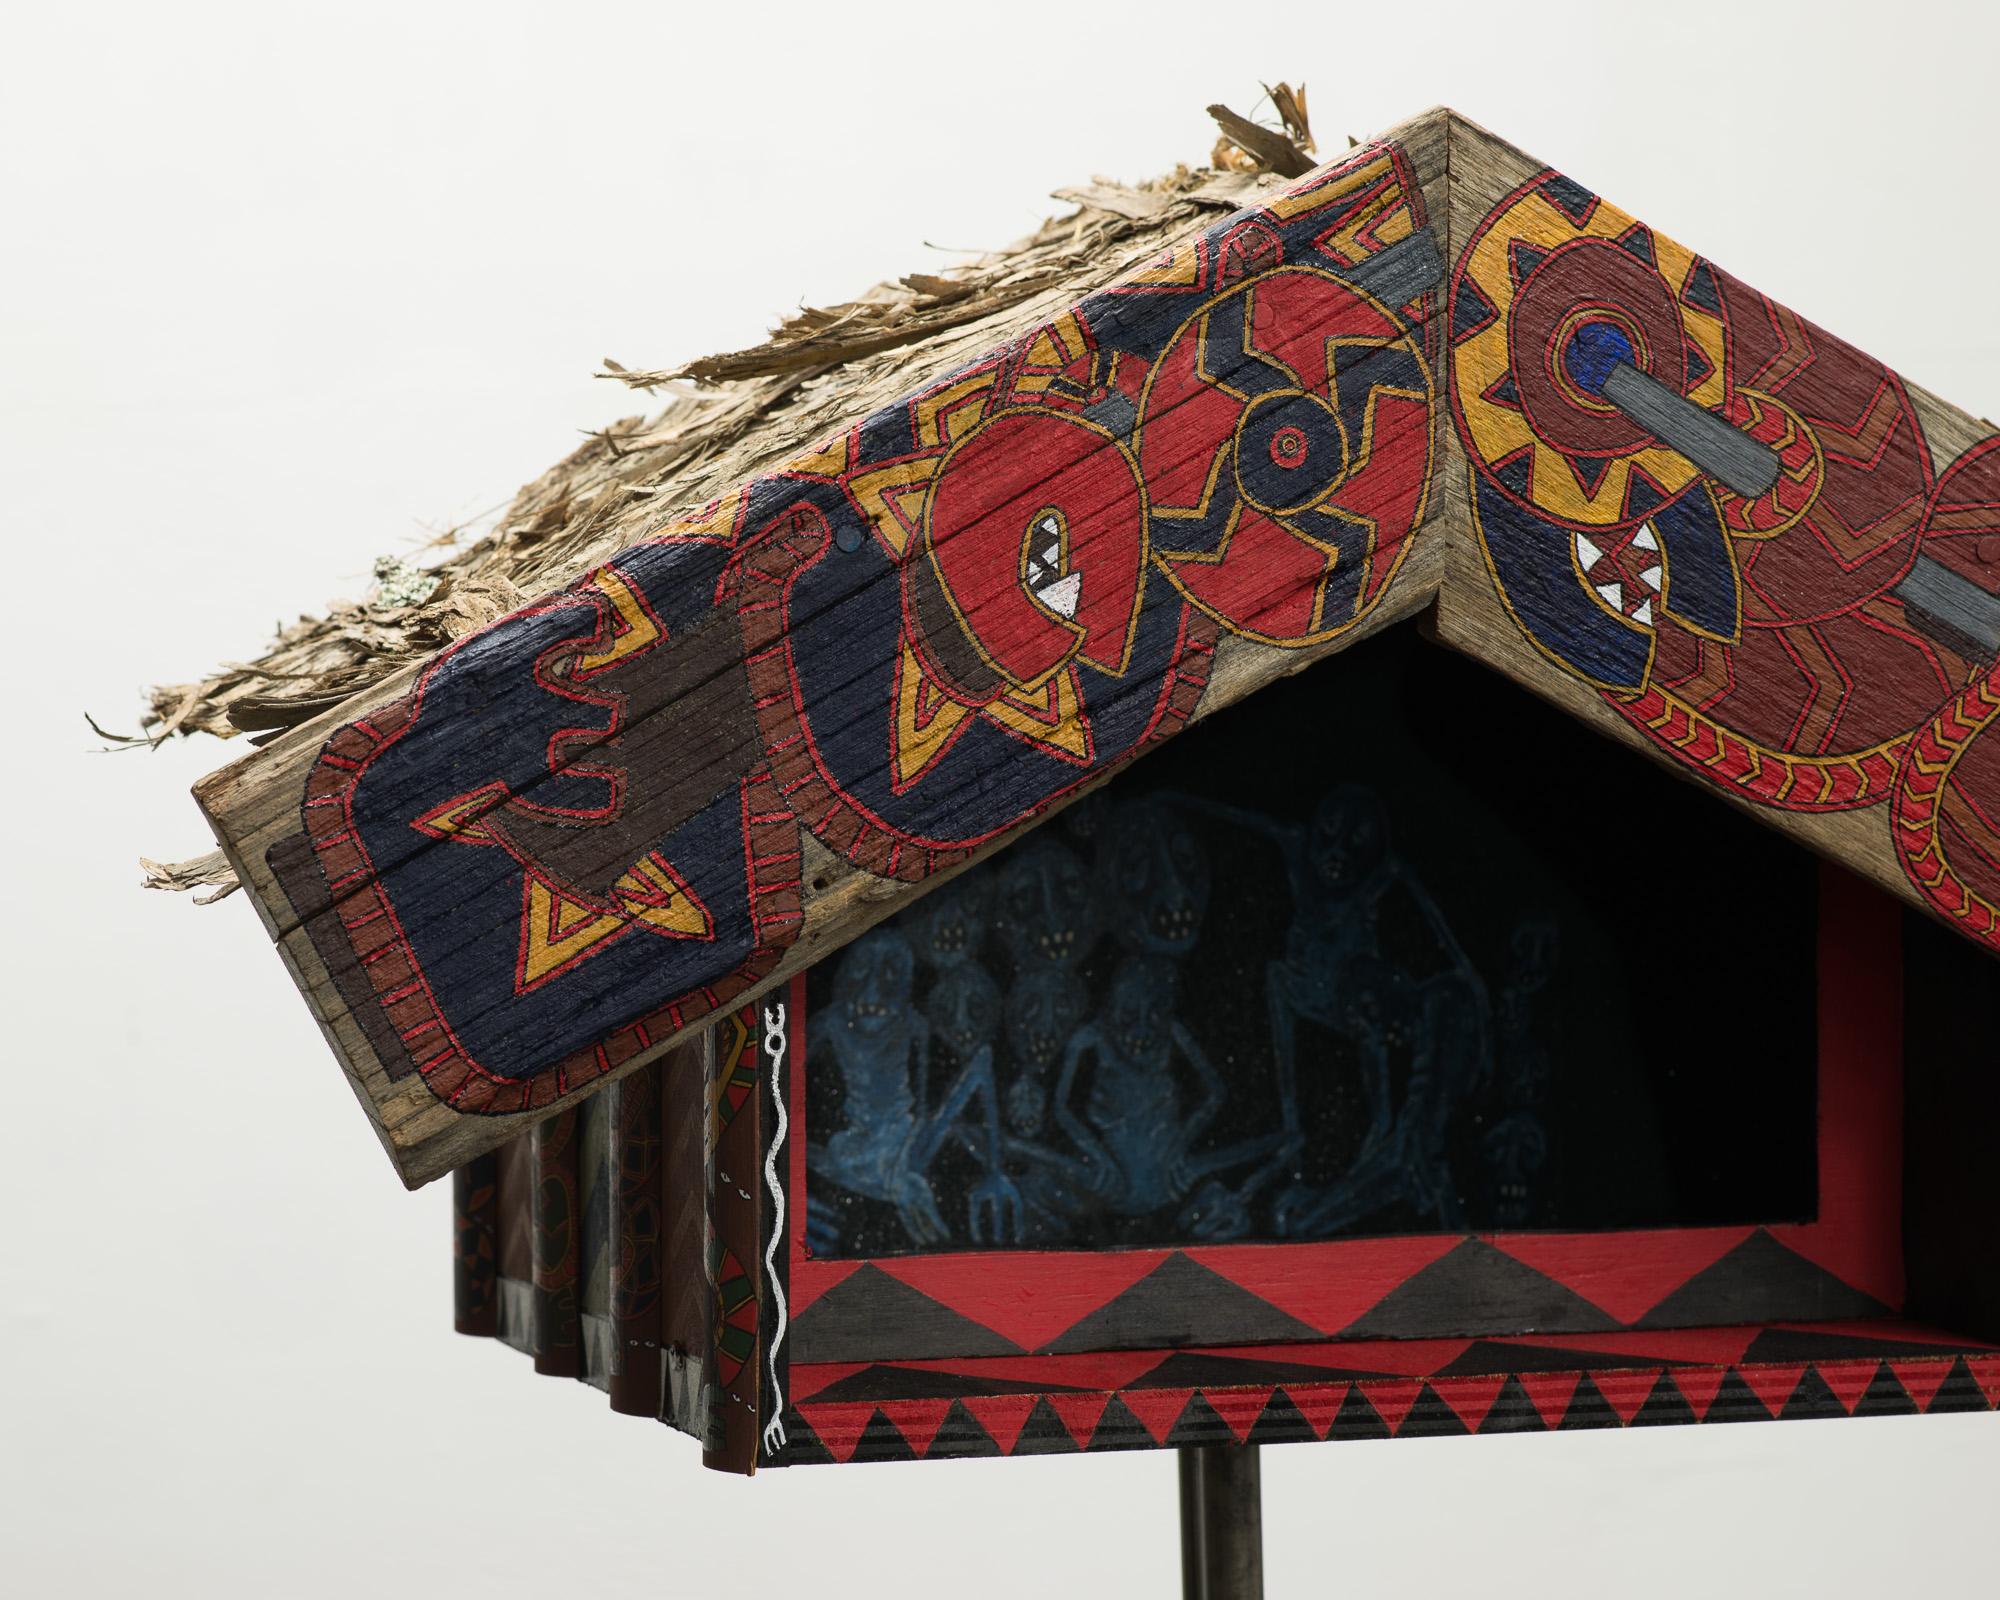 Whetumatarau (Pataka installation) detail  2015  Acrylic, glitter, Manuka, mechanics, Musket heirloom on wood  186 x 40 x 70.5cm